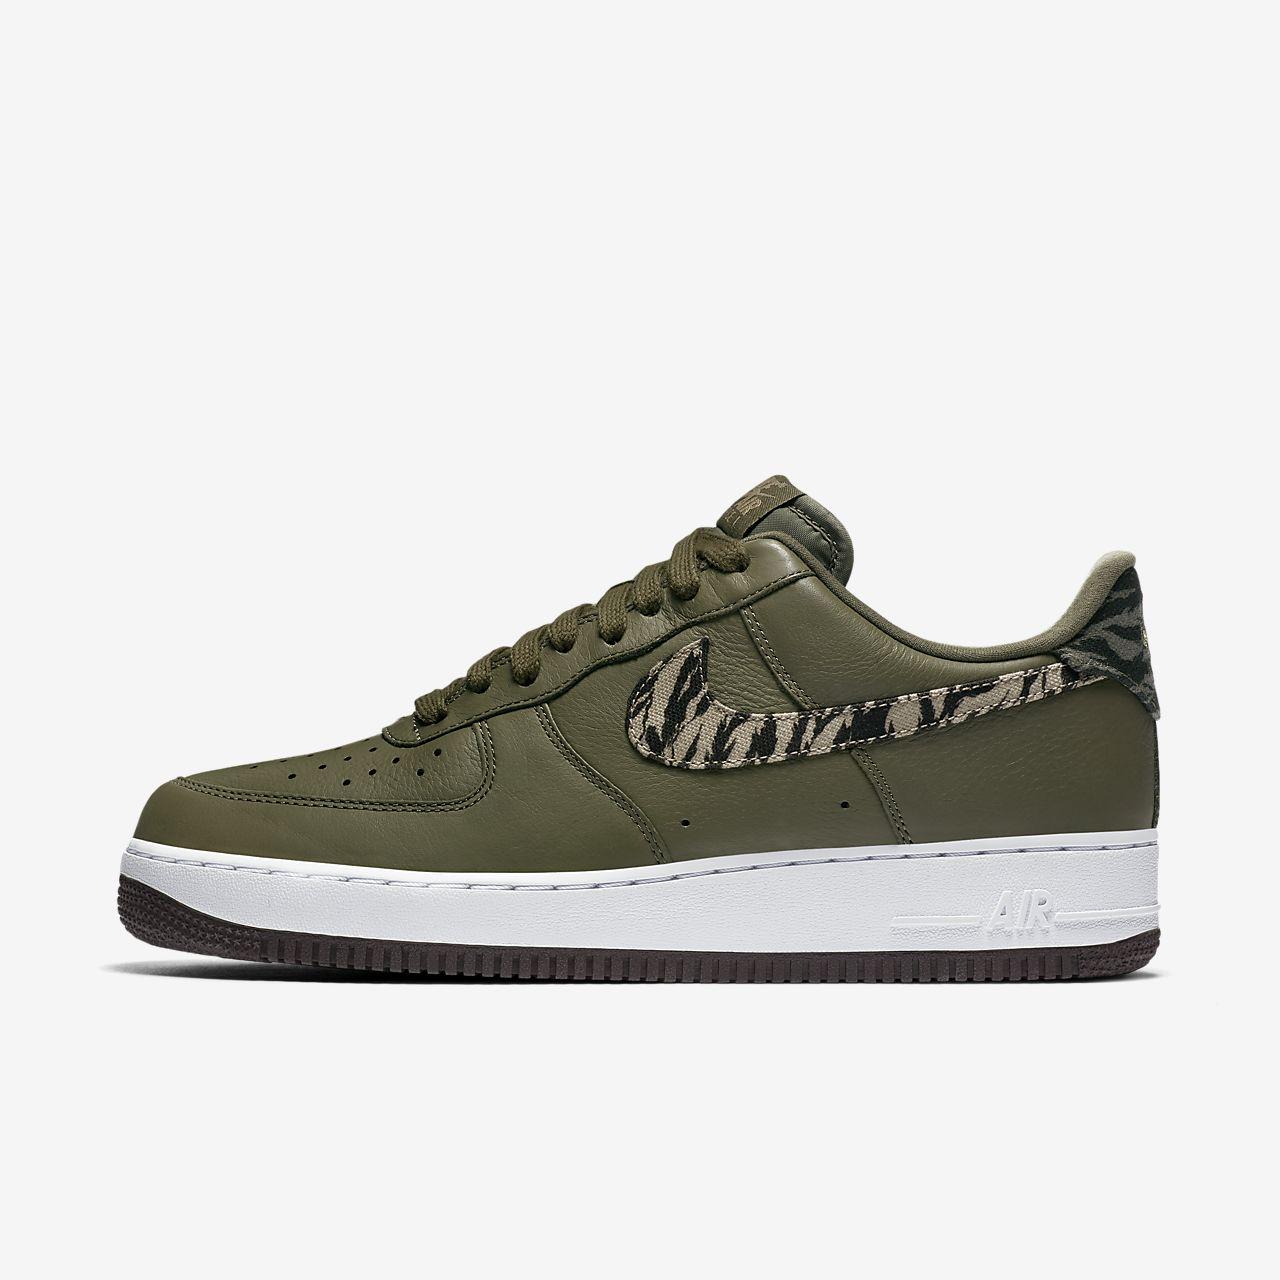 Bleu Chaussures Nike Air Force En Taille 35 Hommes J4AOWXtI